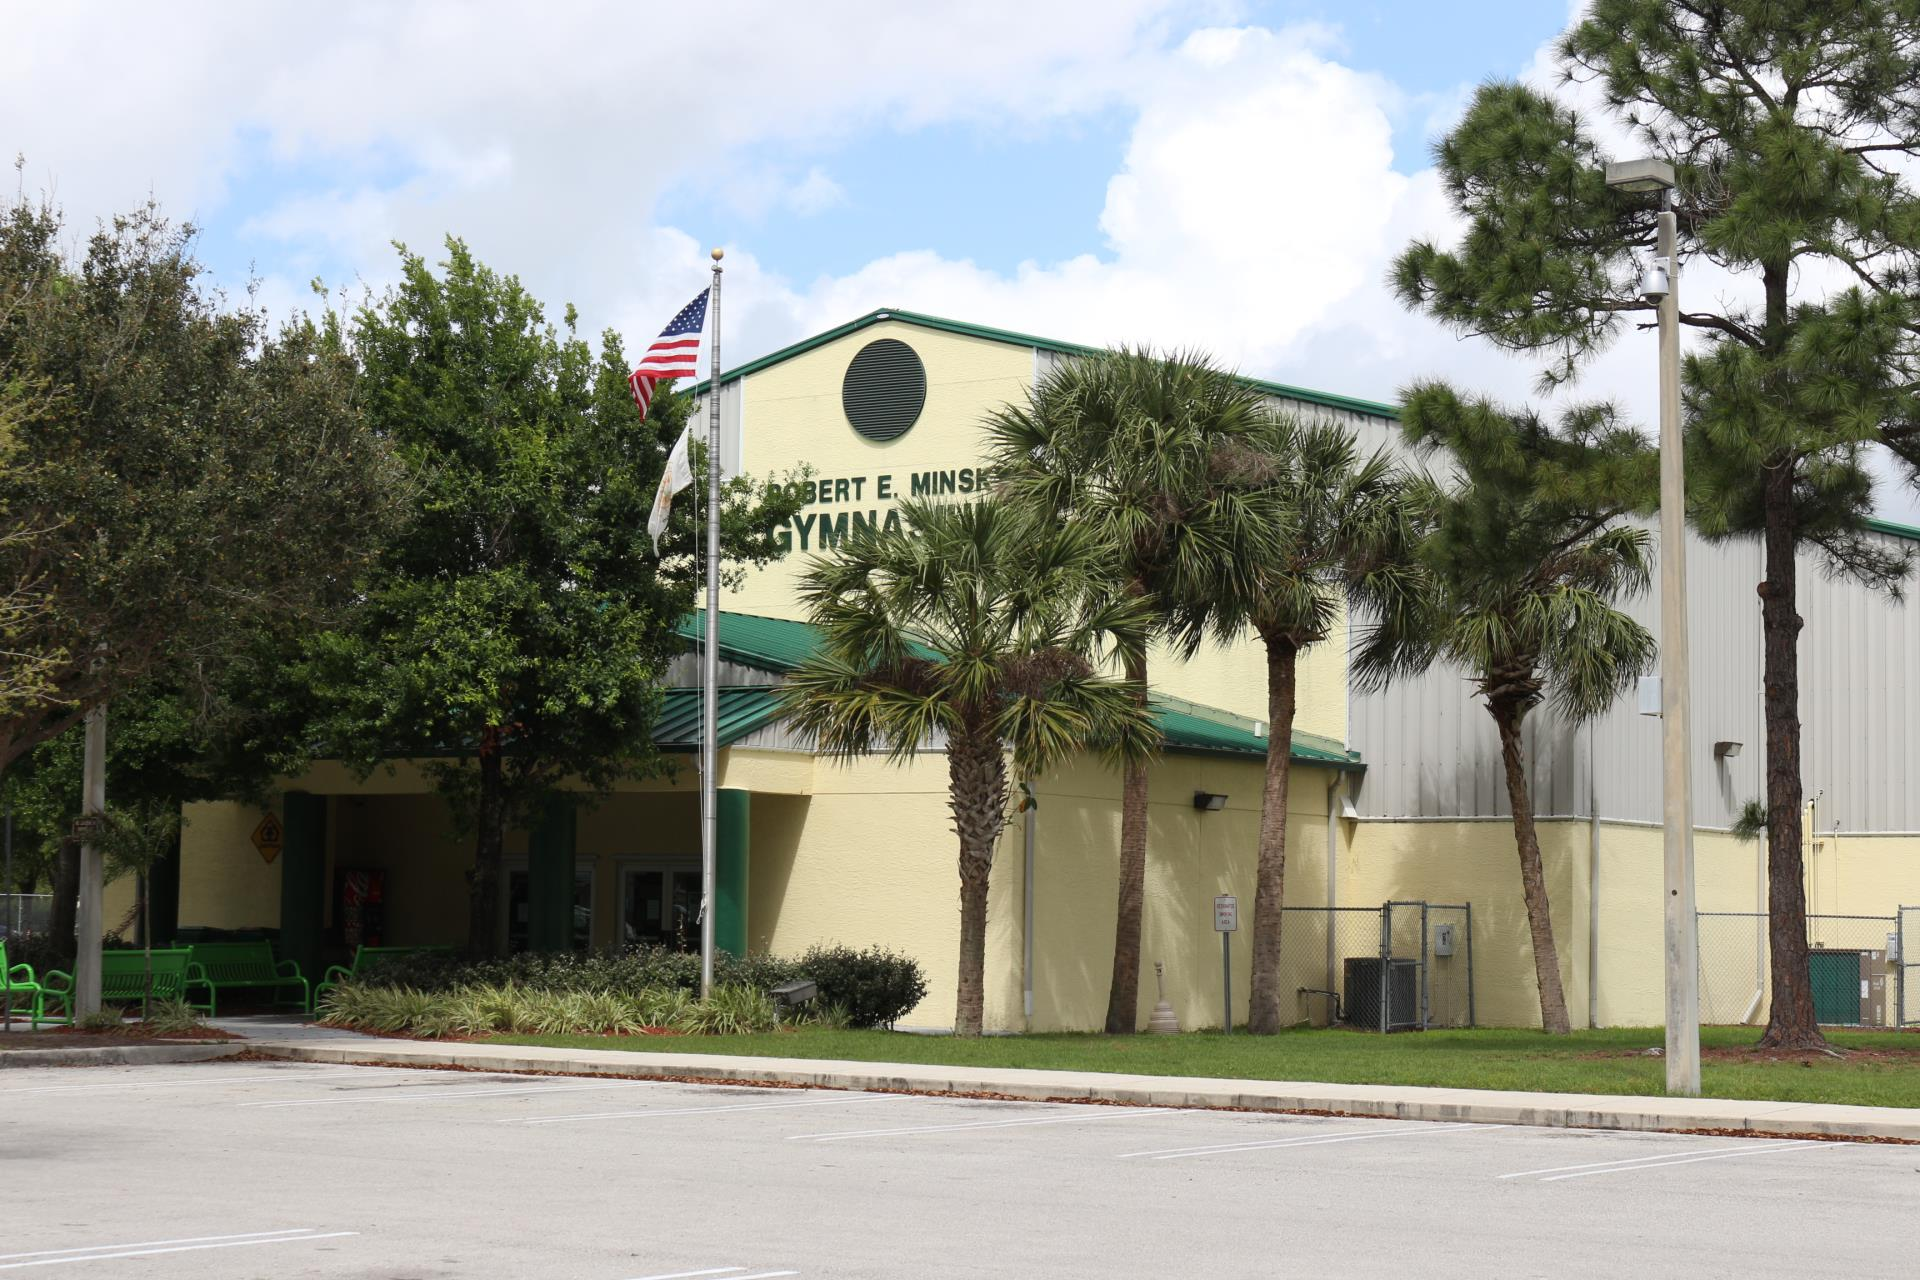 Port St Lucie real estate lawyer Drake Ozment